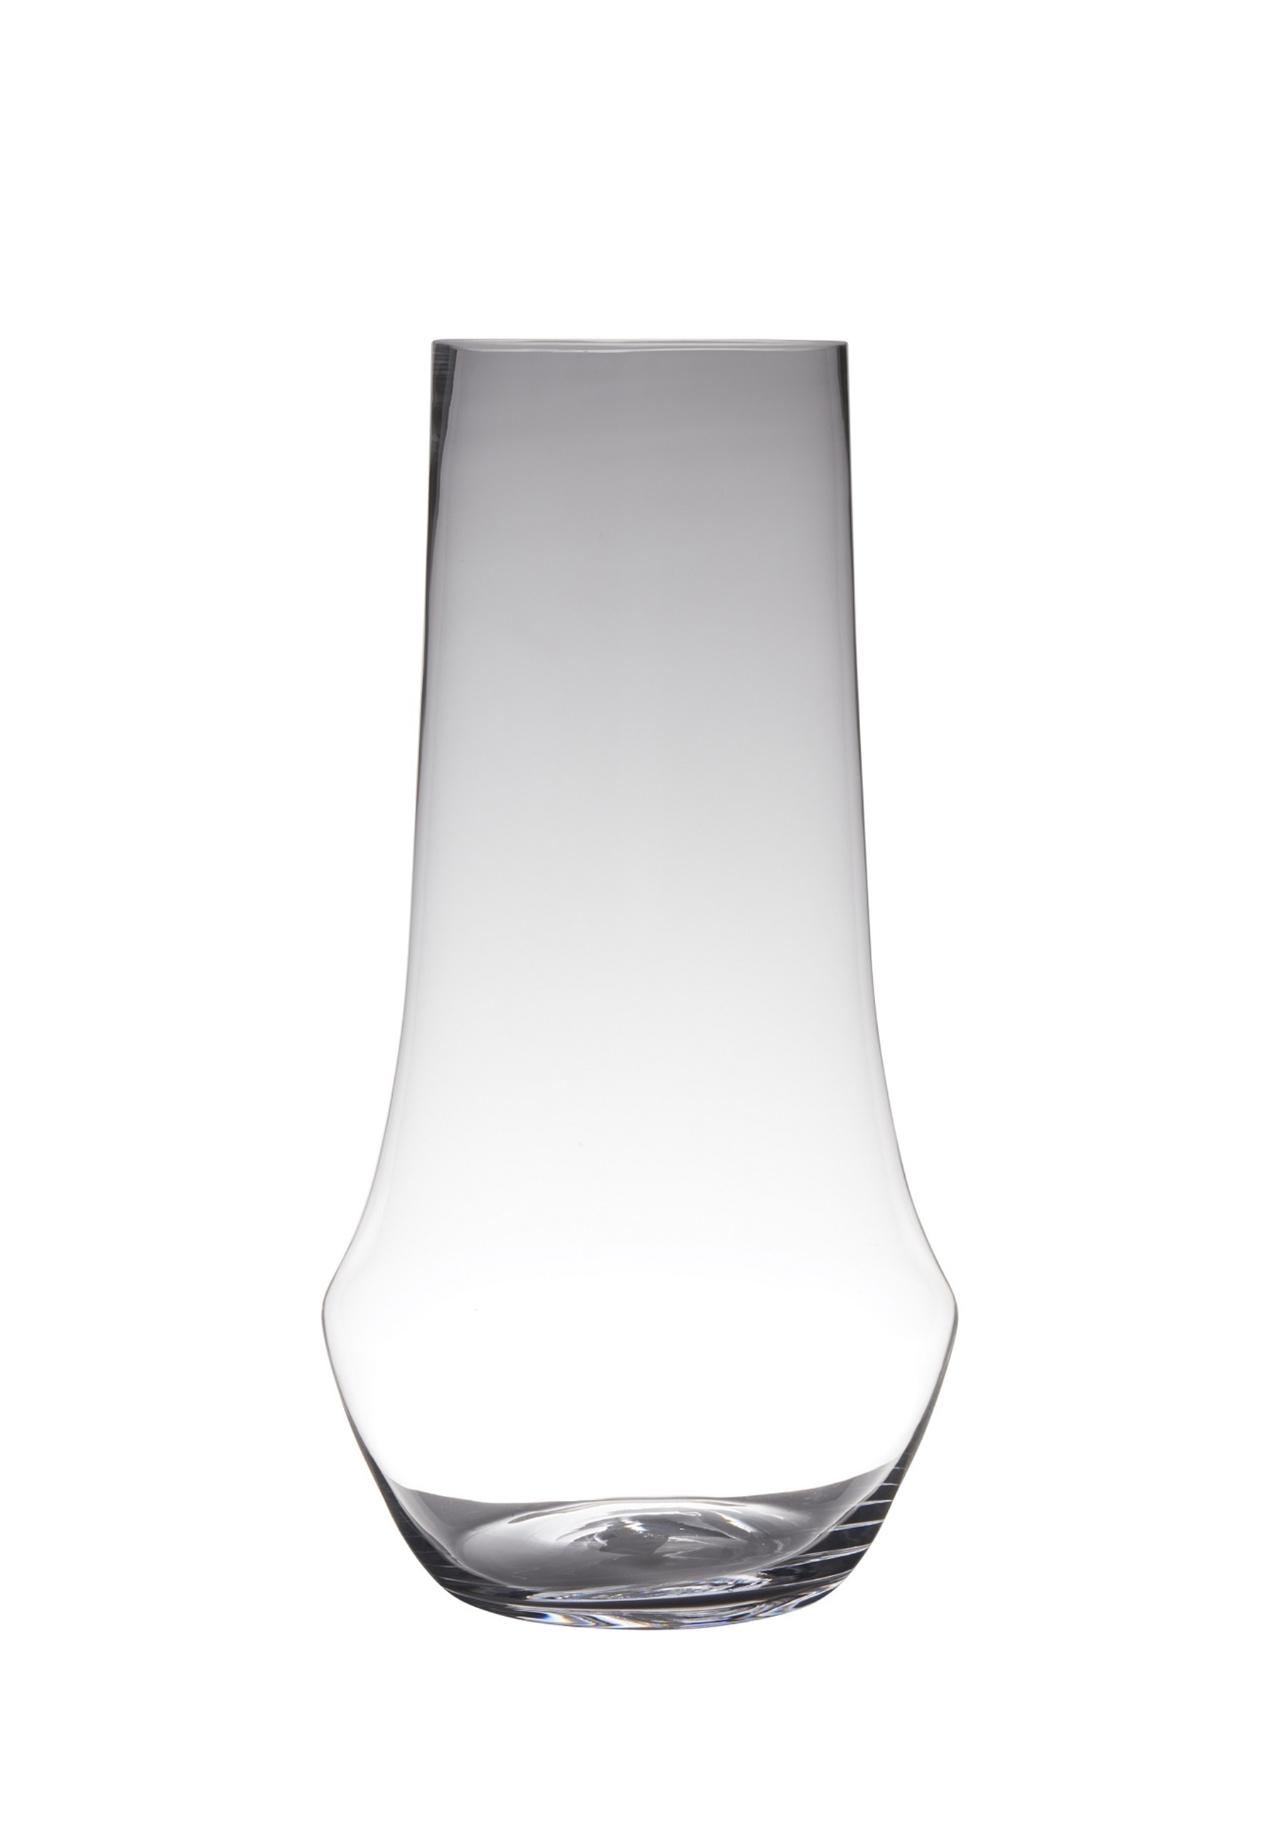 Tokyo Glass Vase | alvaluz.com